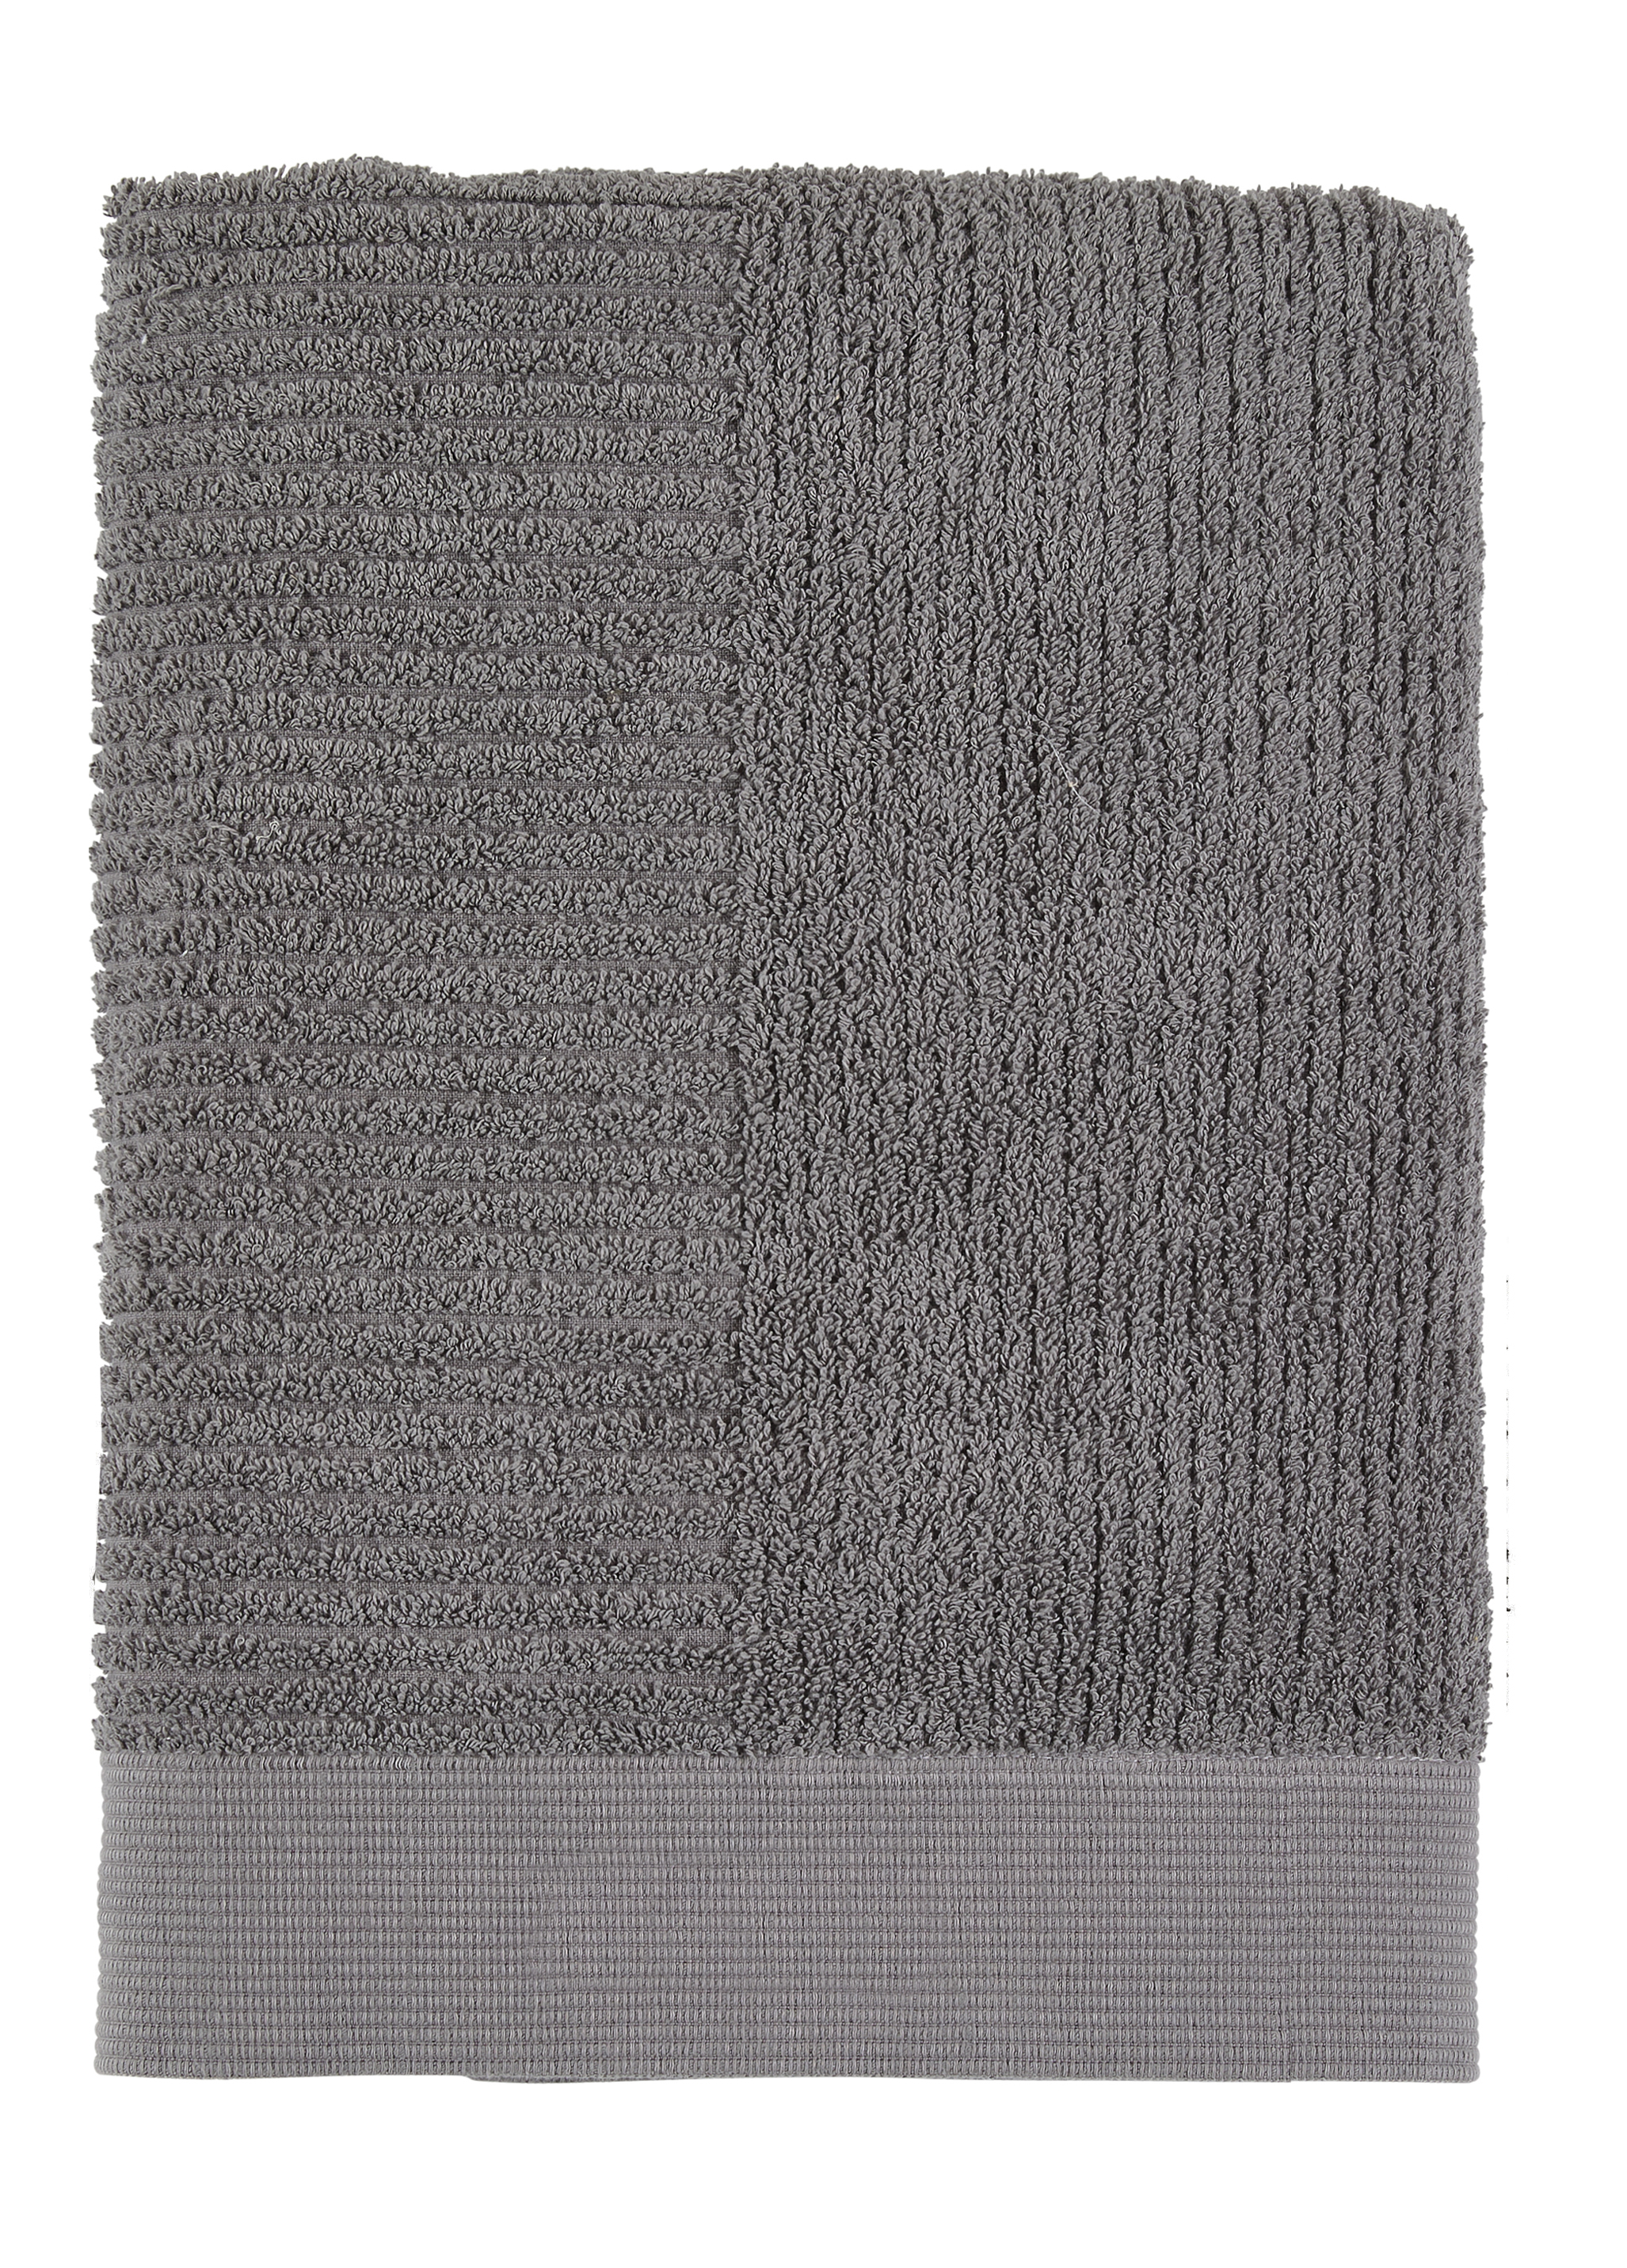 Zone - Classic Towel 70 x 140 cm - Classic Grey (330308)